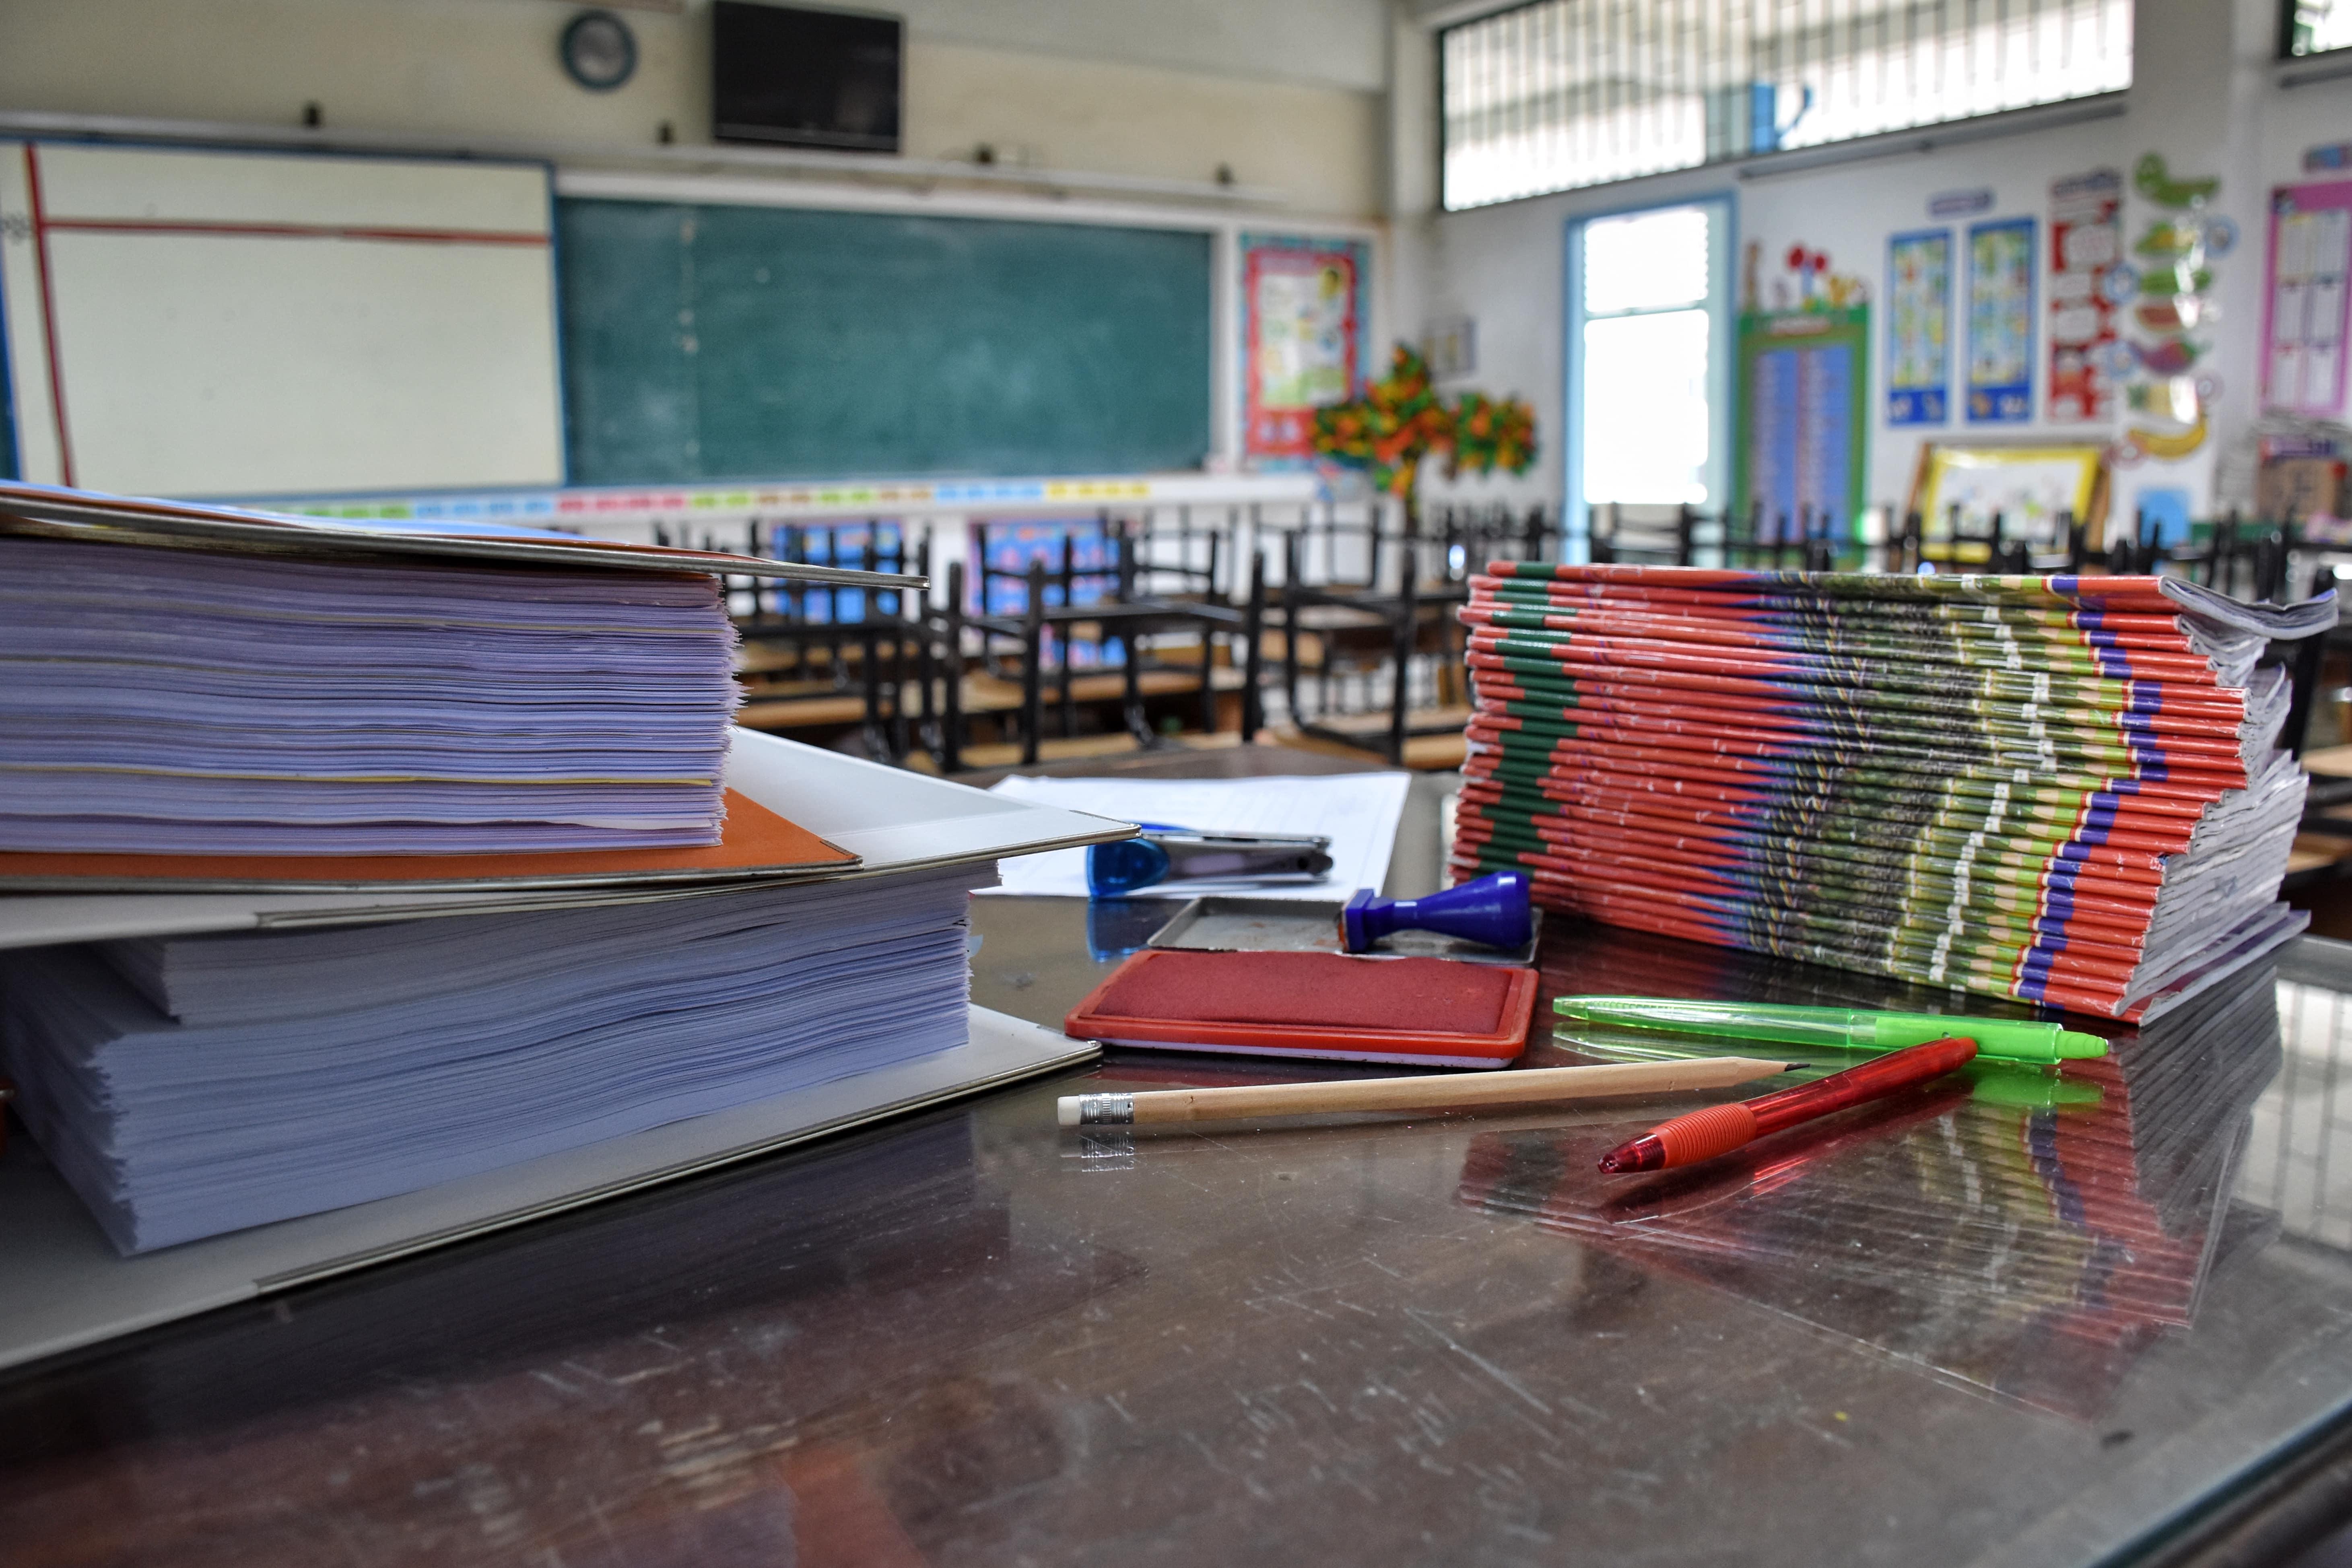 National Teacher Shortage: Certified Teachers are in Demand